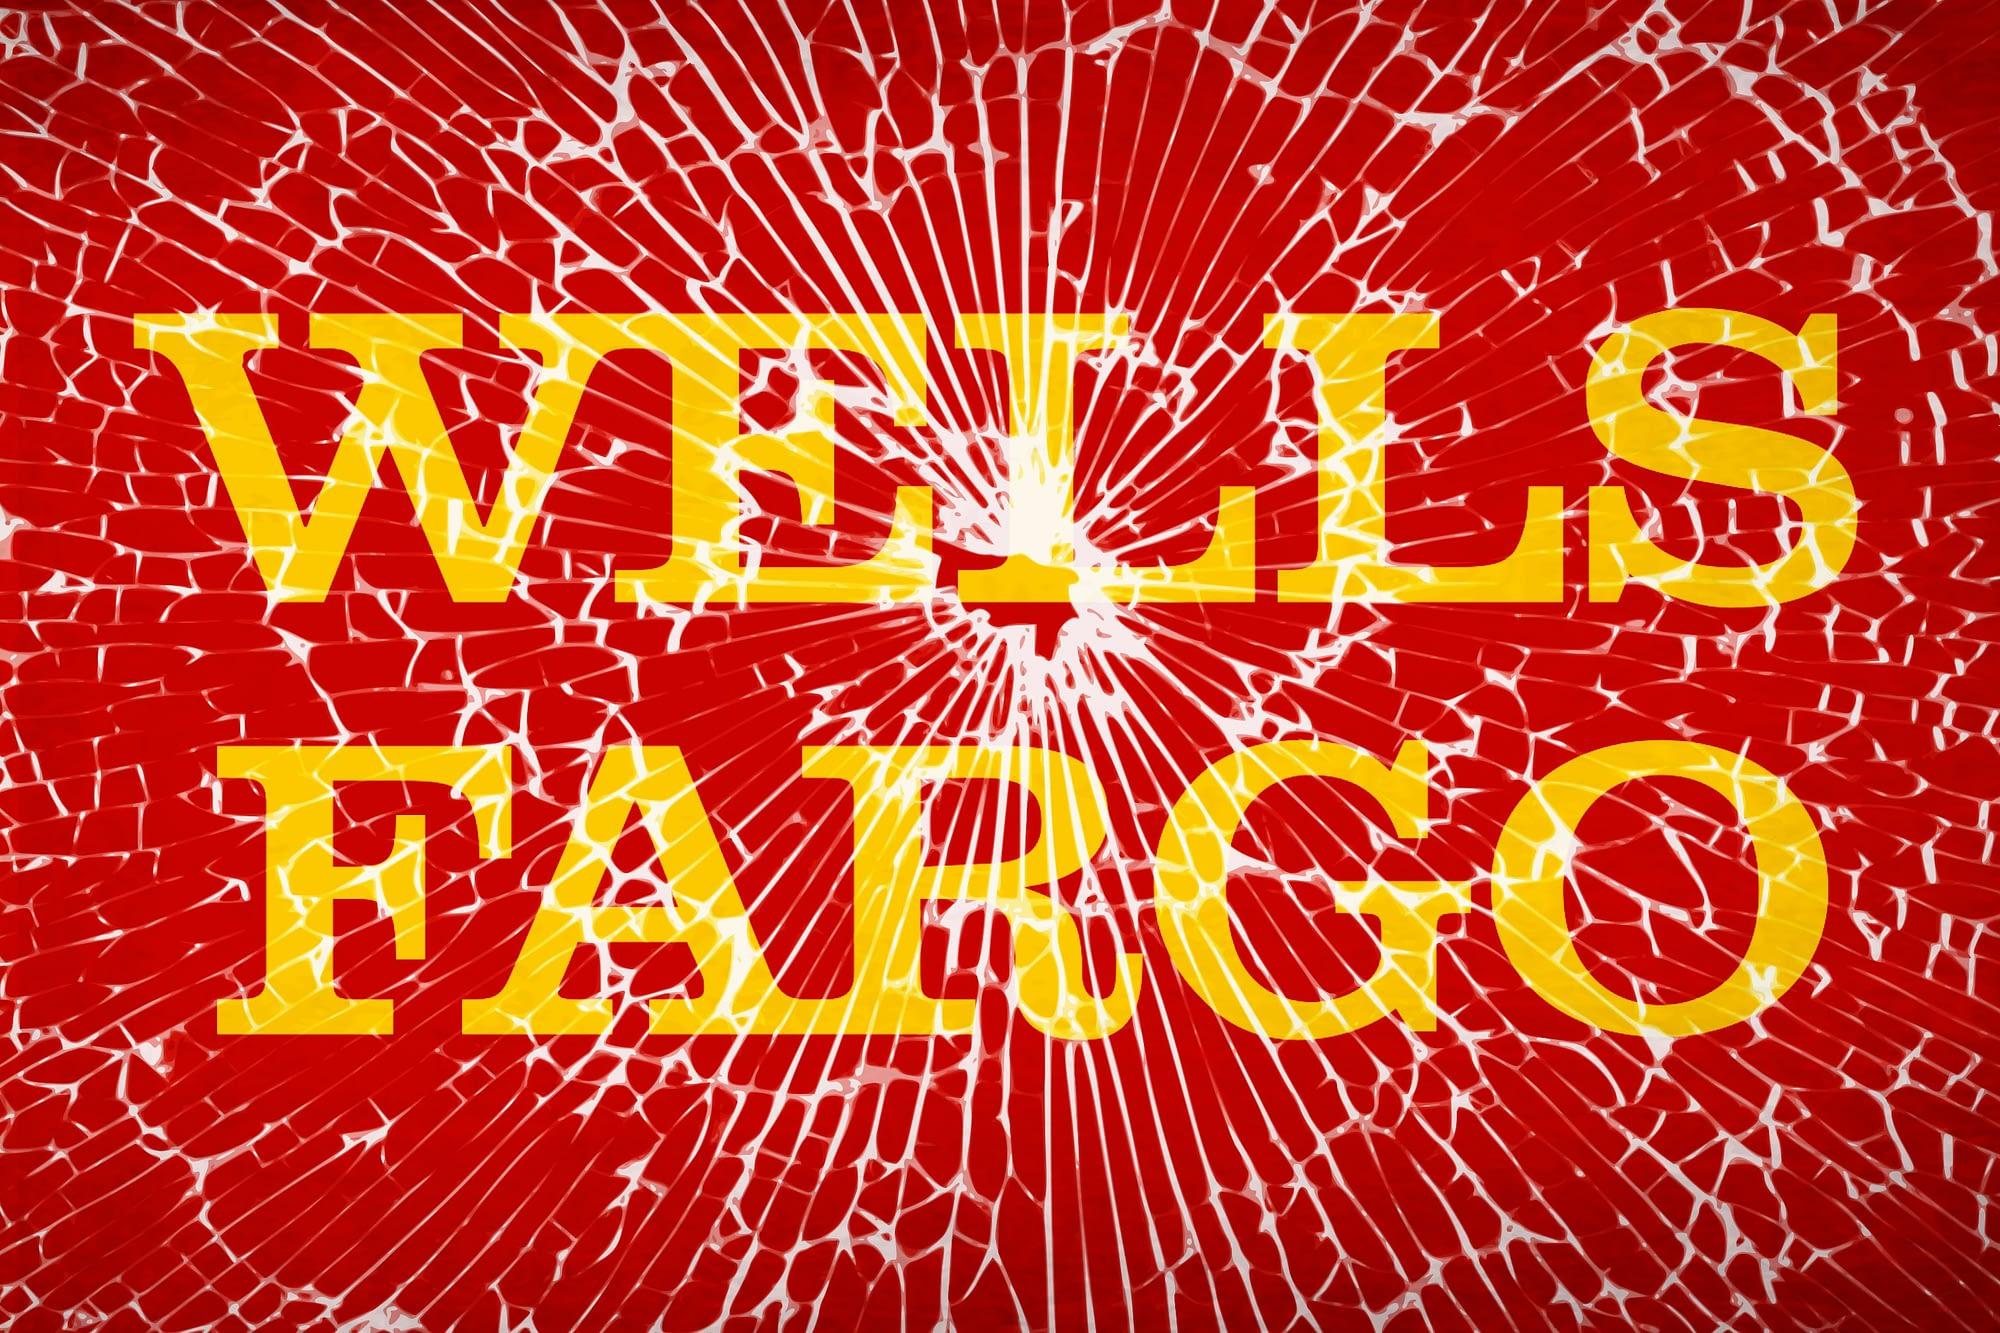 Illustration of Wells Fargo logo behind broken glass screen.